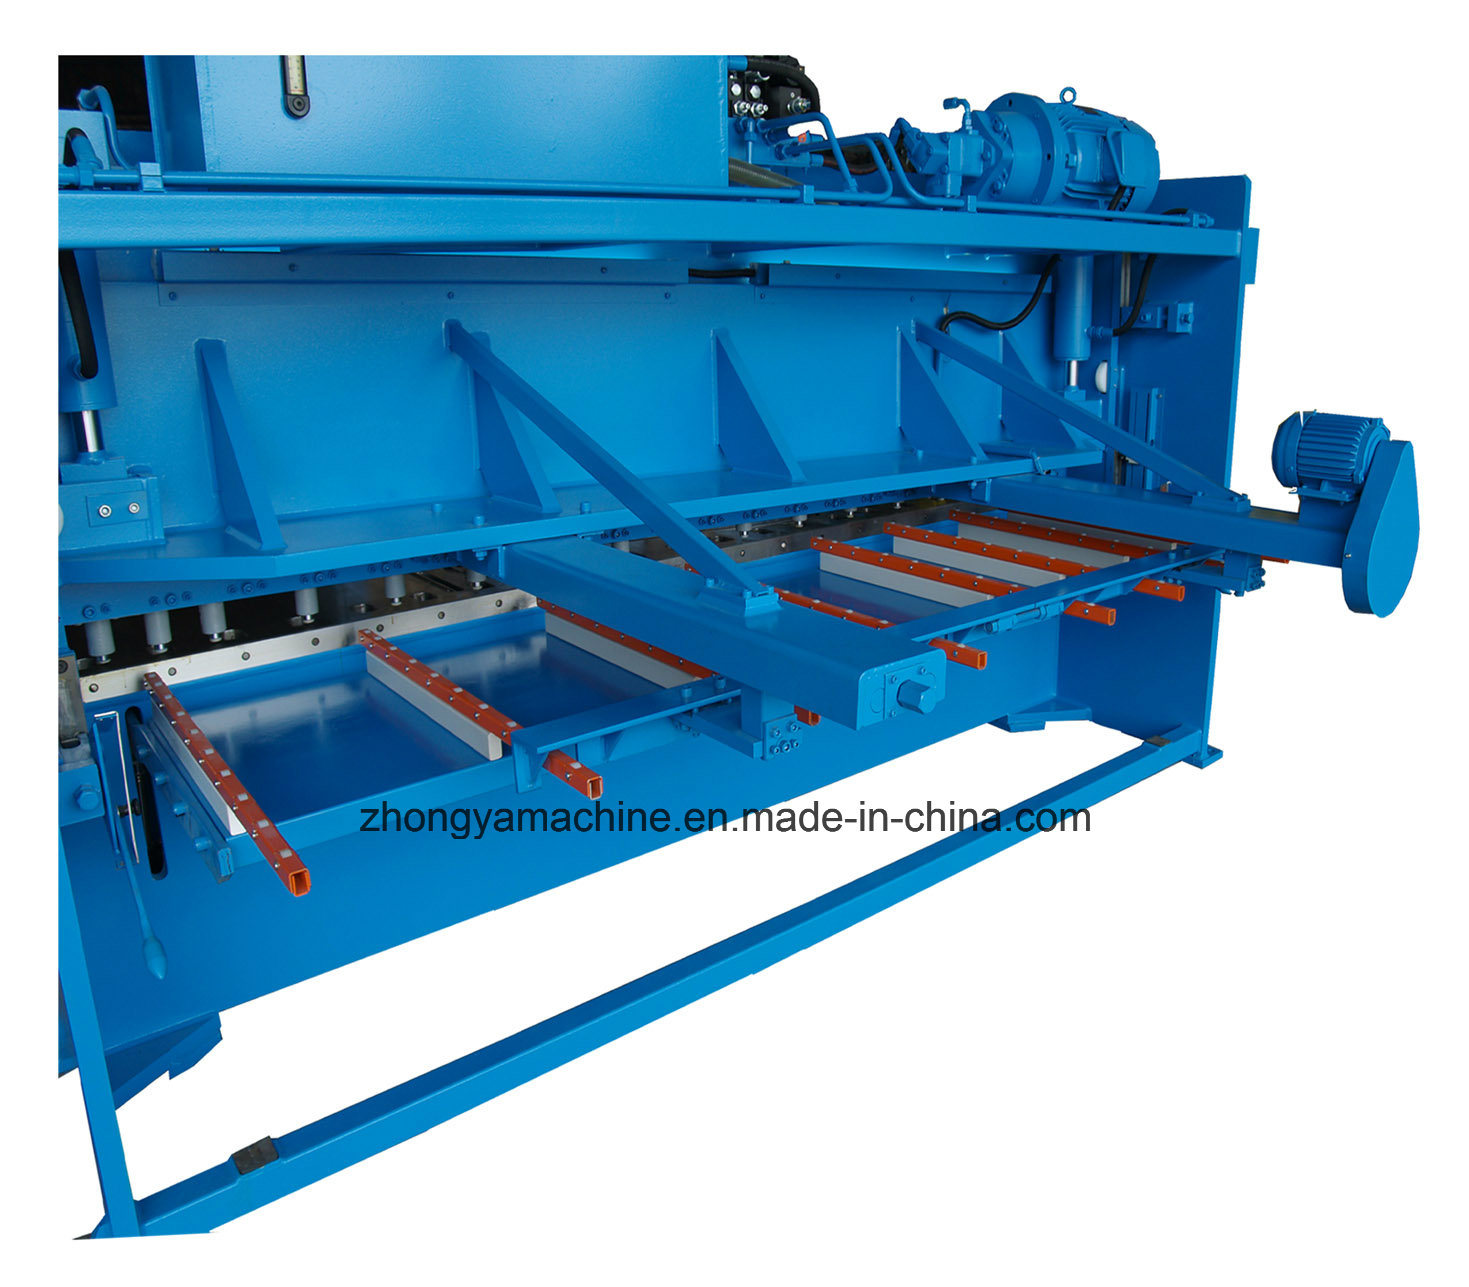 China High Quality Hydraulic Shearing Machine QC11y-8/4000